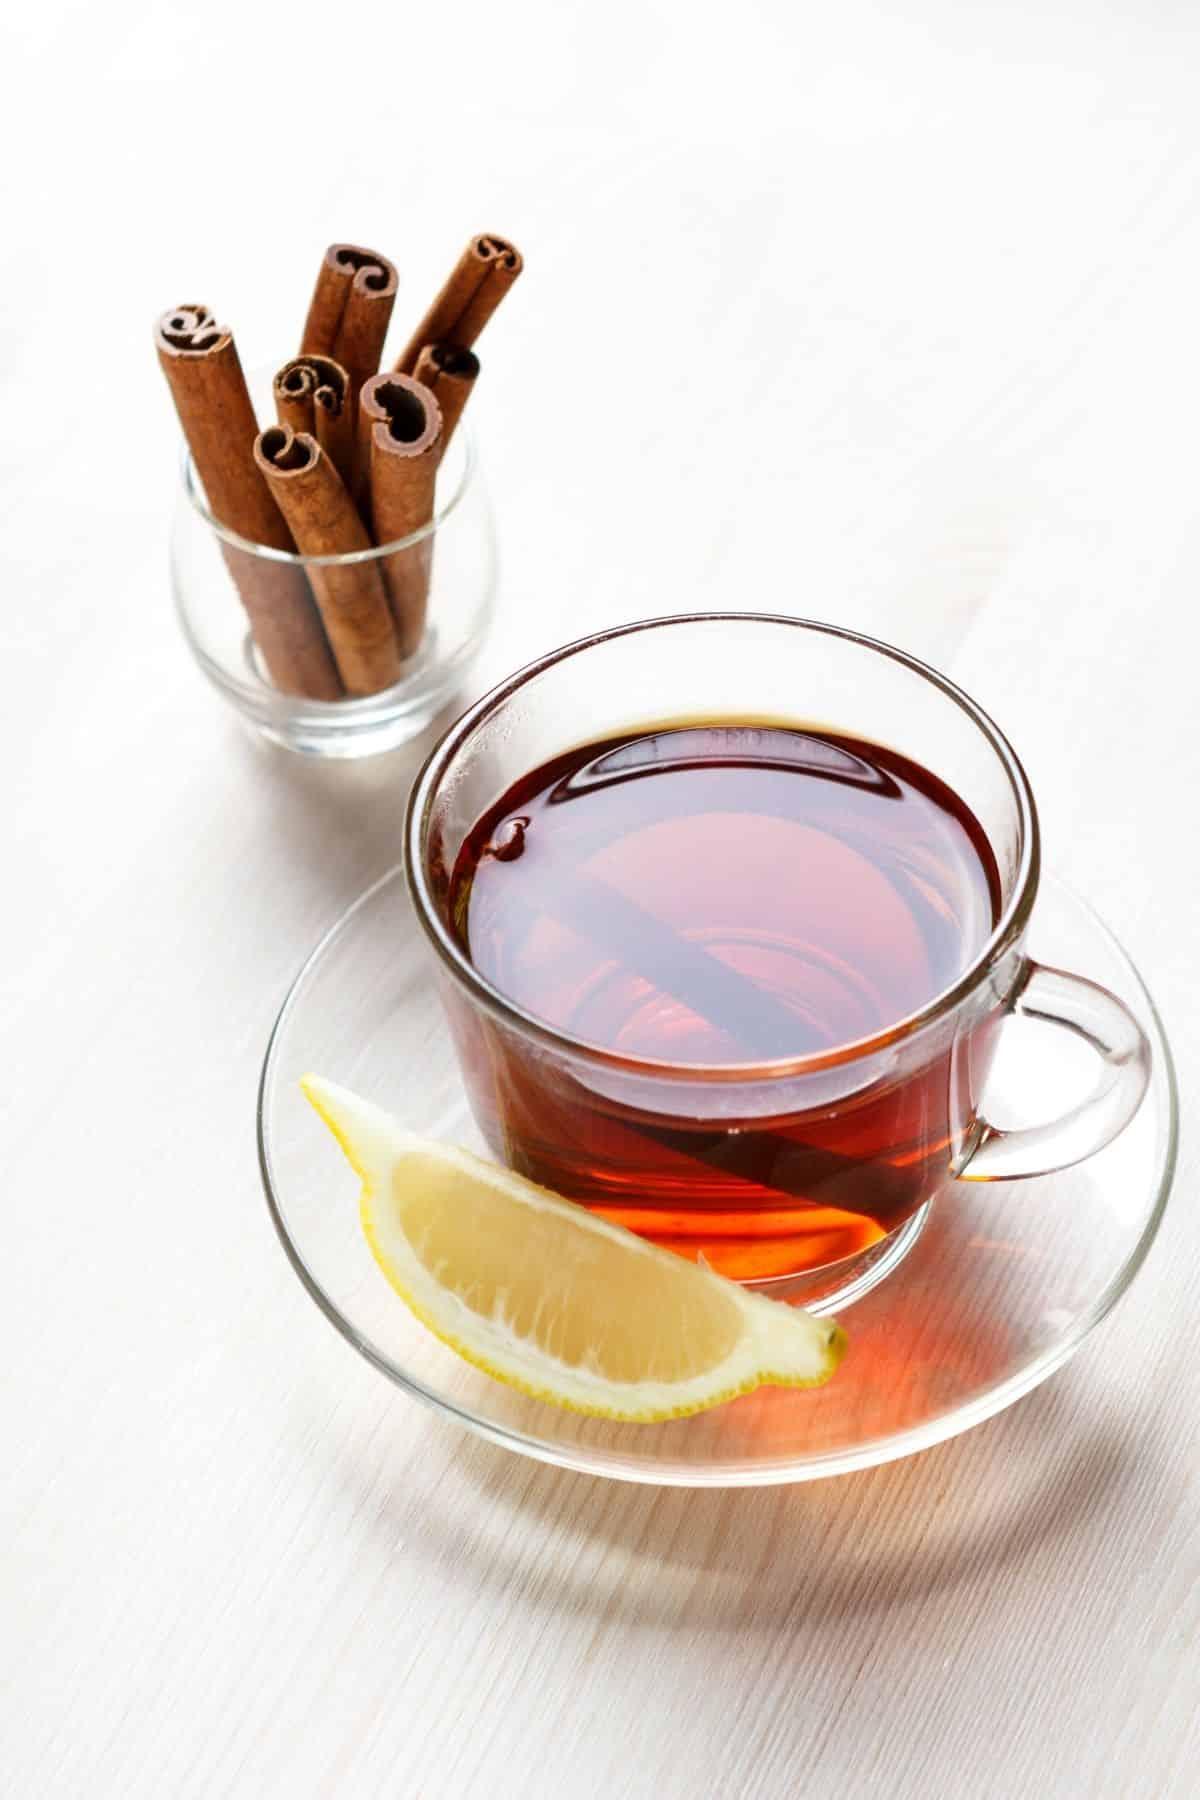 cinnamon tea served in a glass mug with a slice of fresh lemon